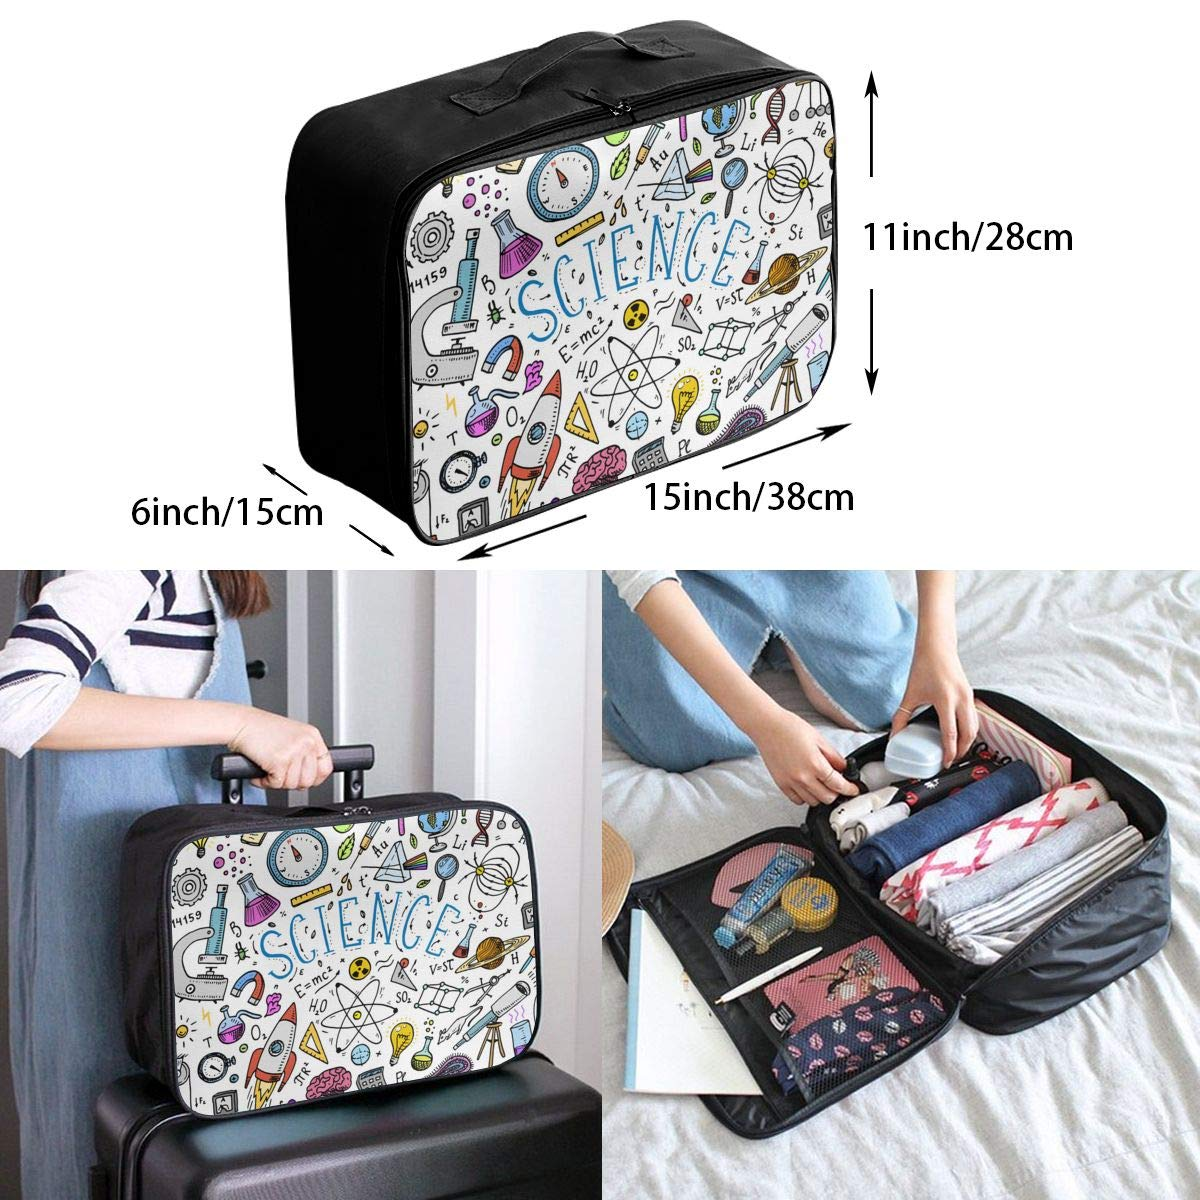 ADGAI Science Canvas Travel Weekender Bag,Fashion Custom Lightweight Large Capacity Portable Luggage Bag,Suitcase Trolley Bag